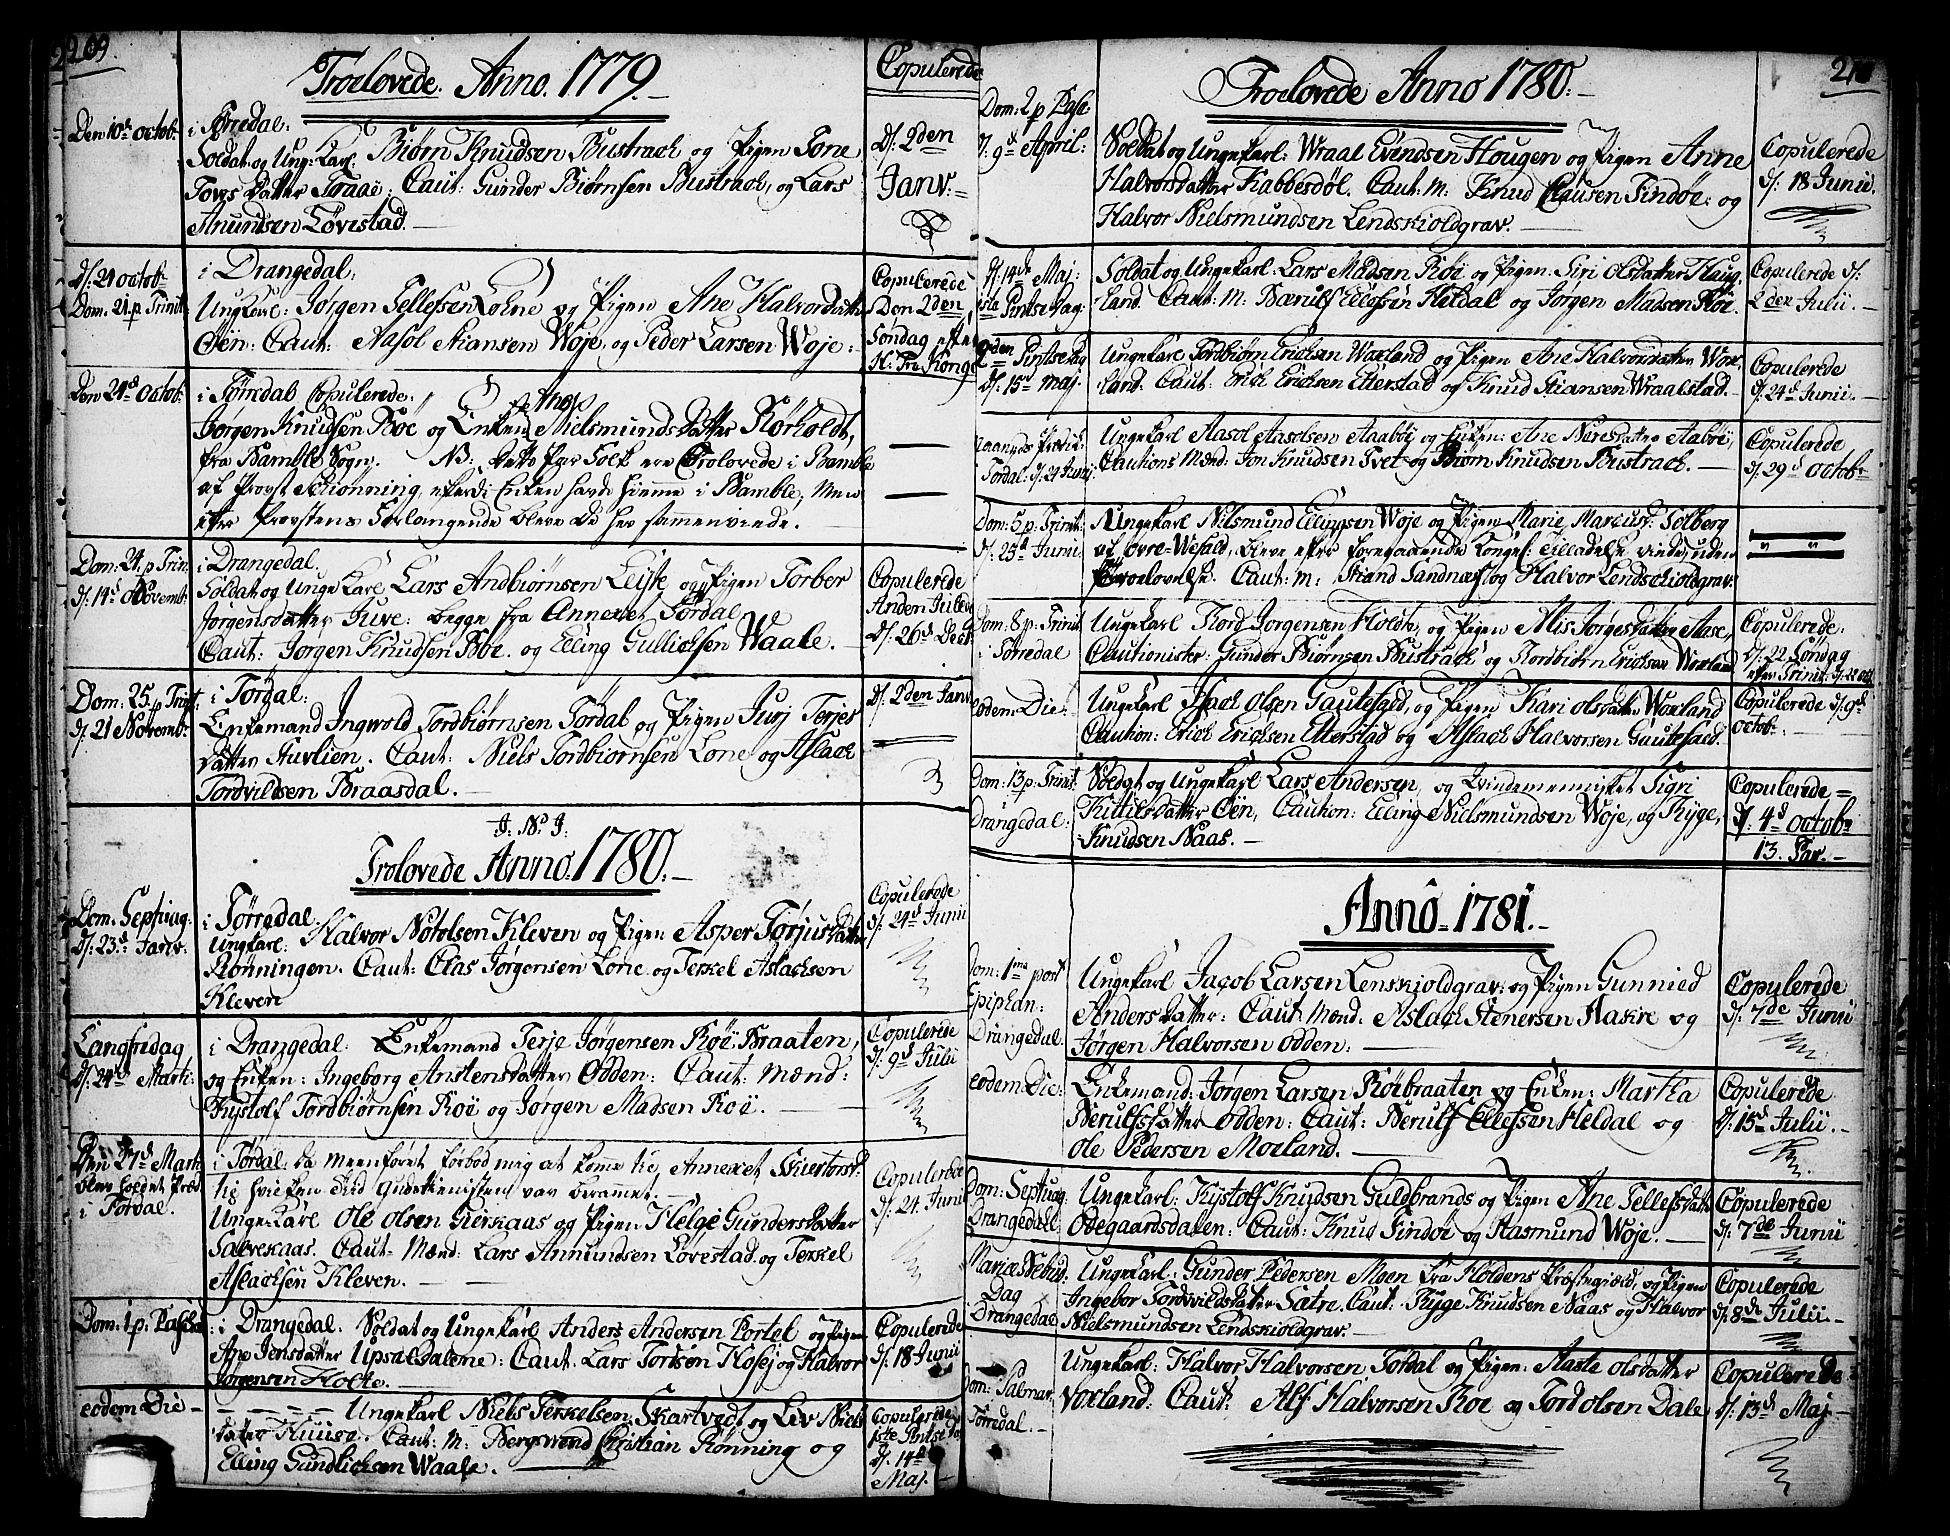 SAKO, Drangedal kirkebøker, F/Fa/L0003: Ministerialbok nr. 3, 1768-1814, s. 209-210